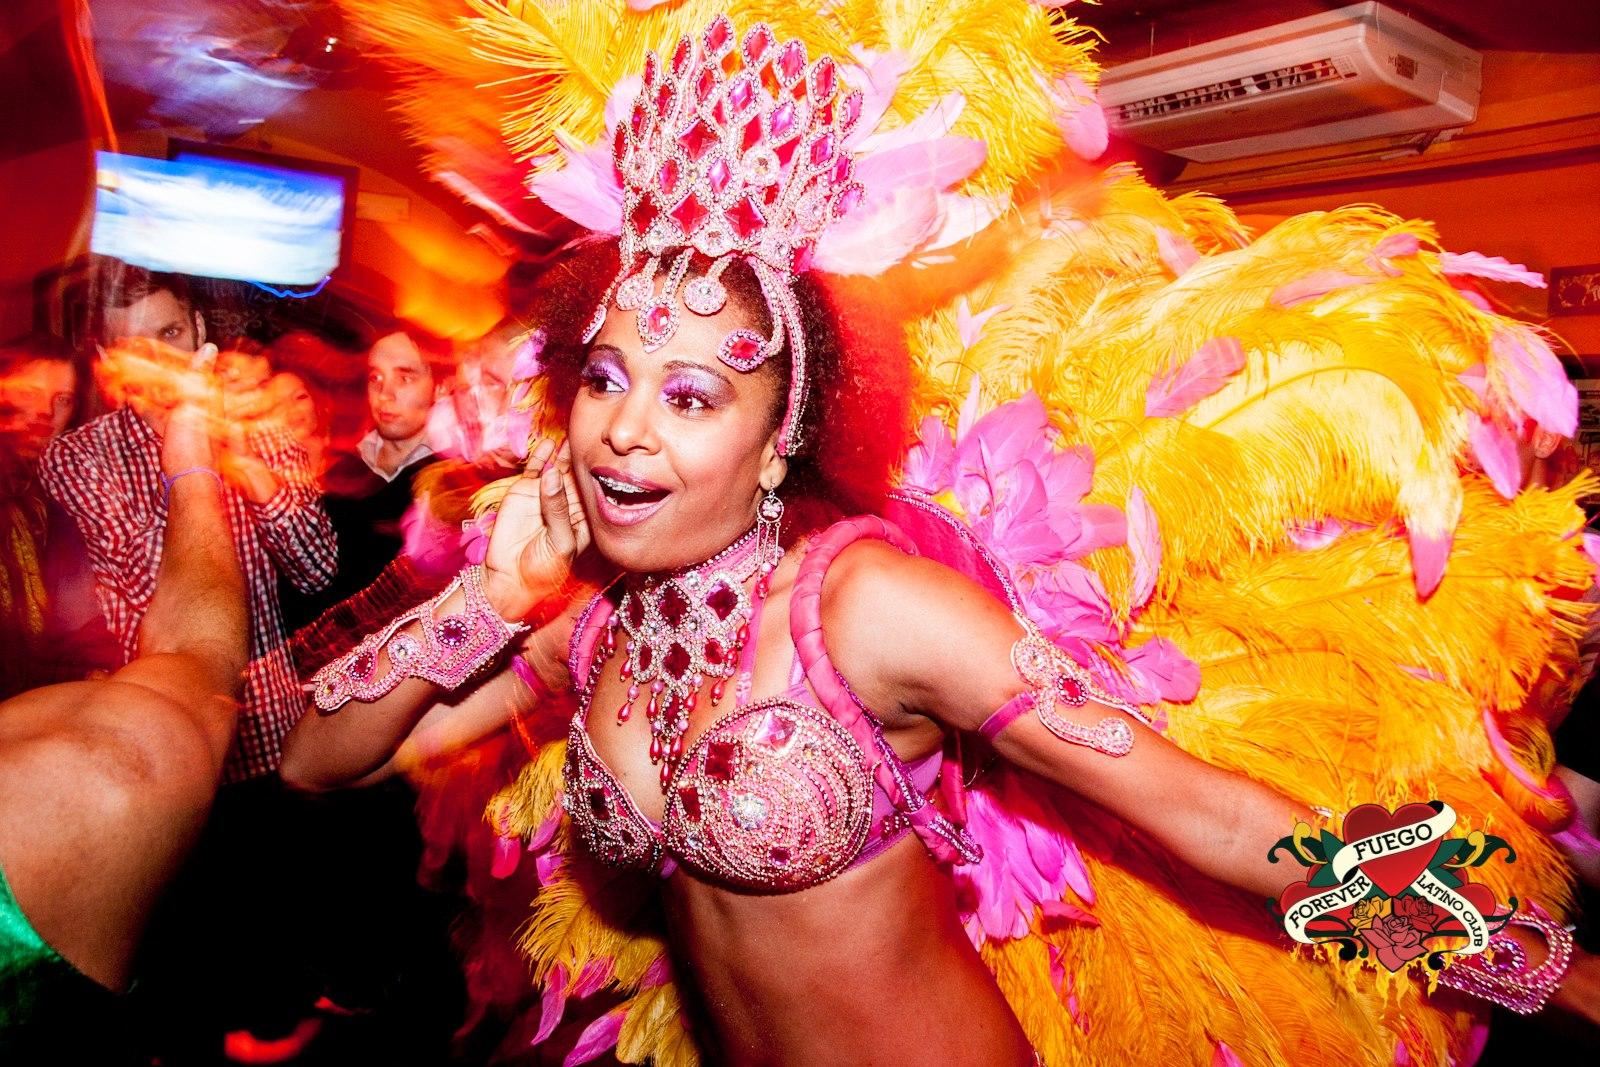 Dj Popi Zabava Fuego Latino Club Obletnica Samba